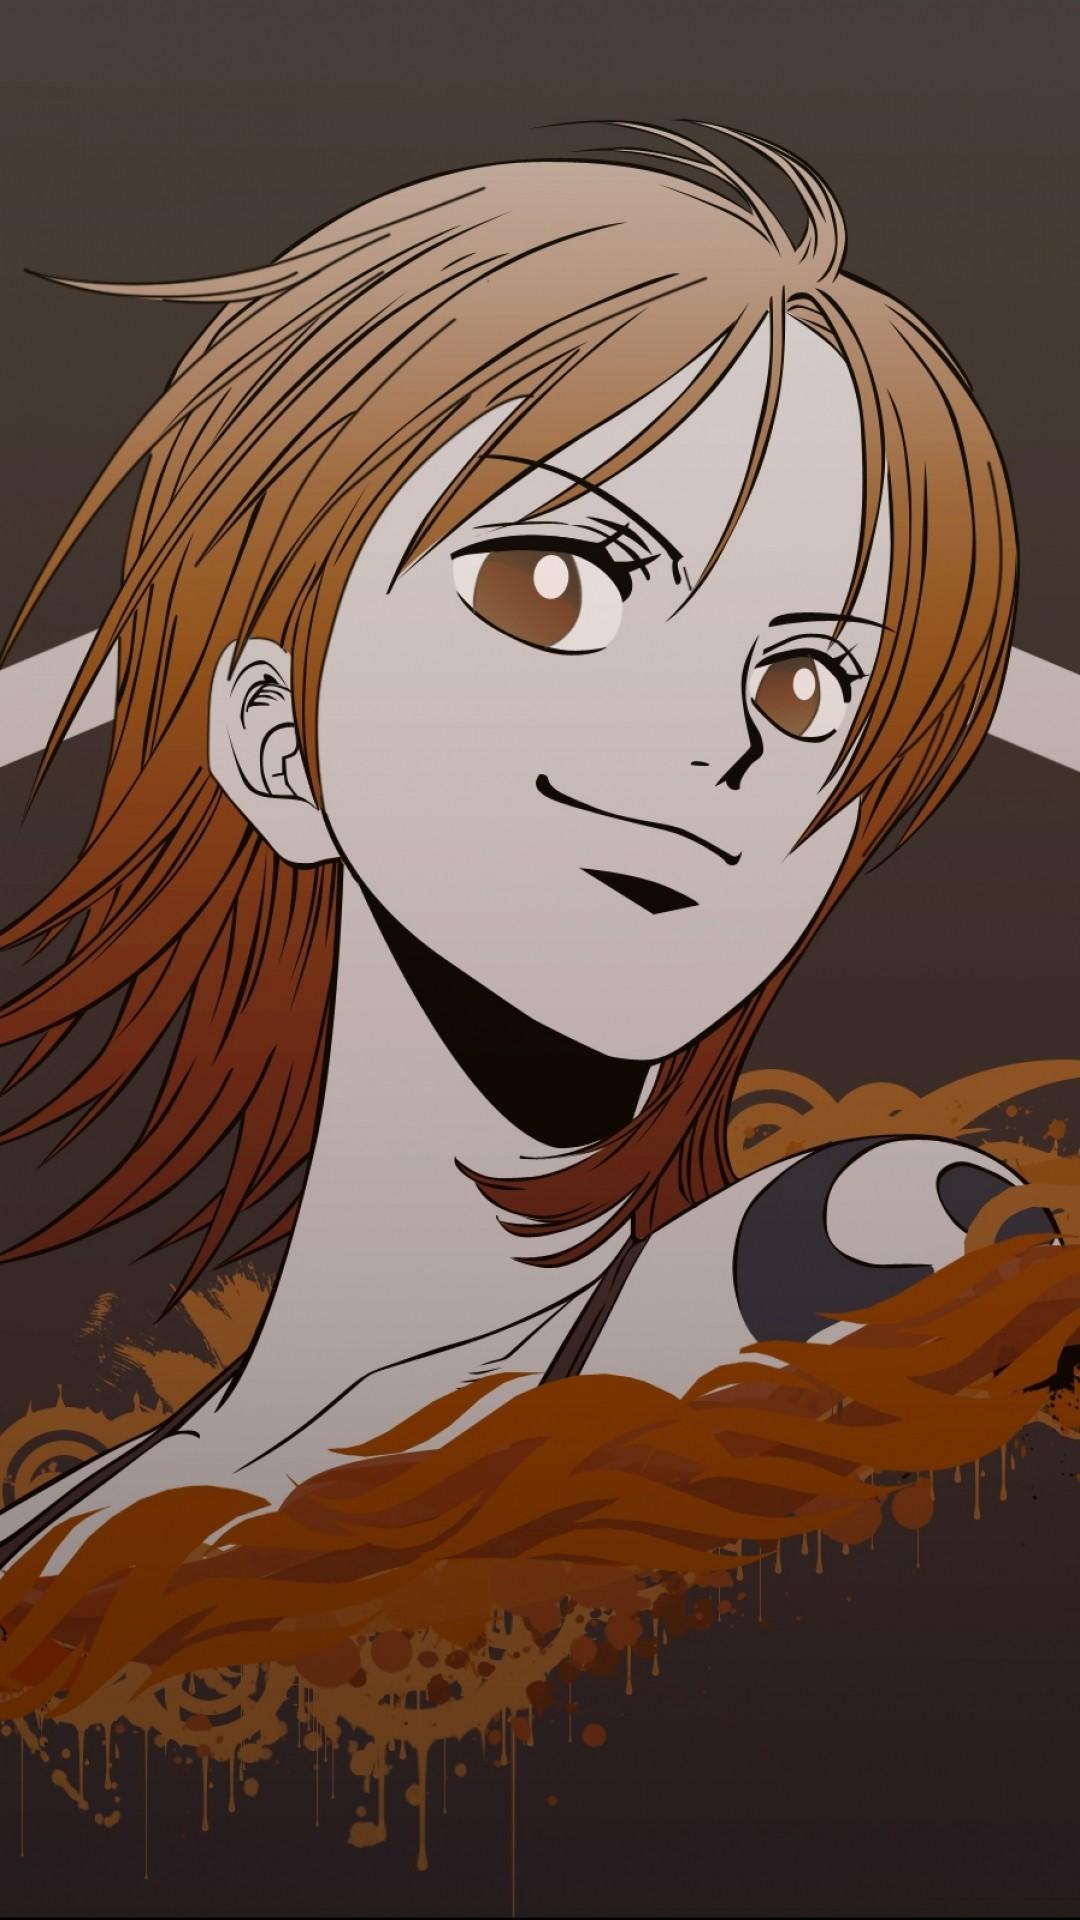 Wiki ワンピース | 天津飯 フィギュアーツの通販 by エミリ|ラクマ